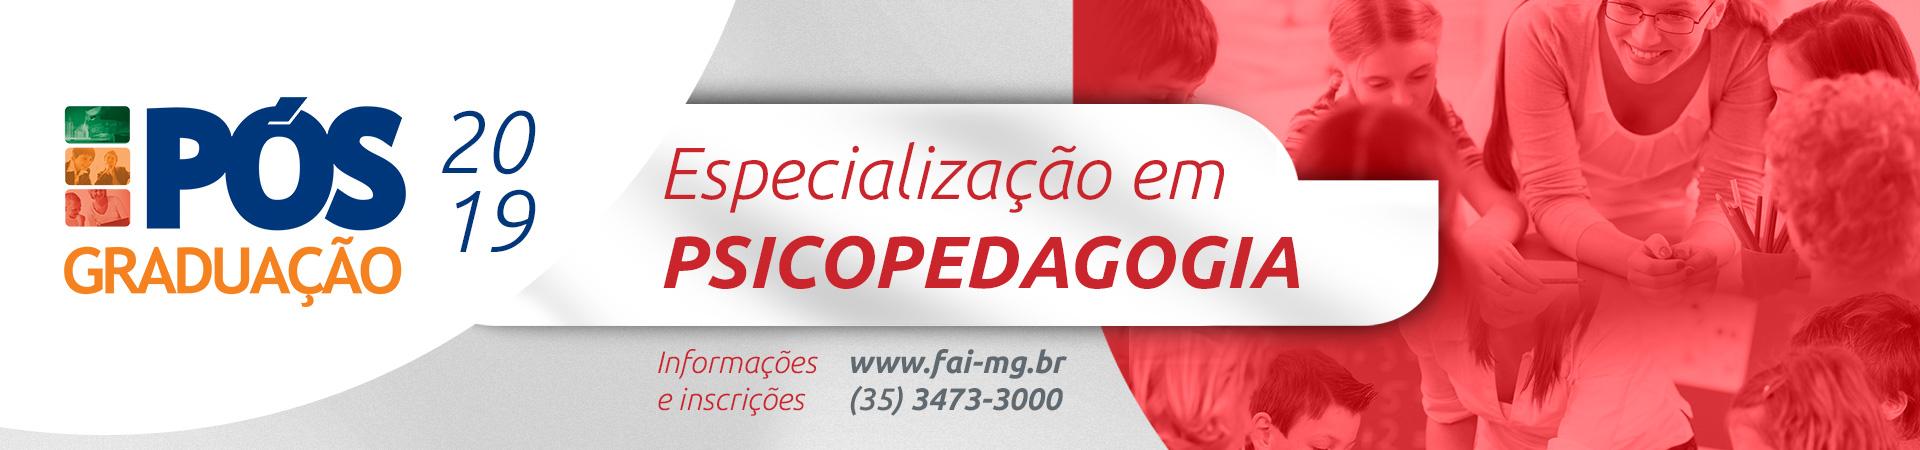 FAI_Ps_Graduao_2019_PSICOPEDAGOGIA_Banner_Portal